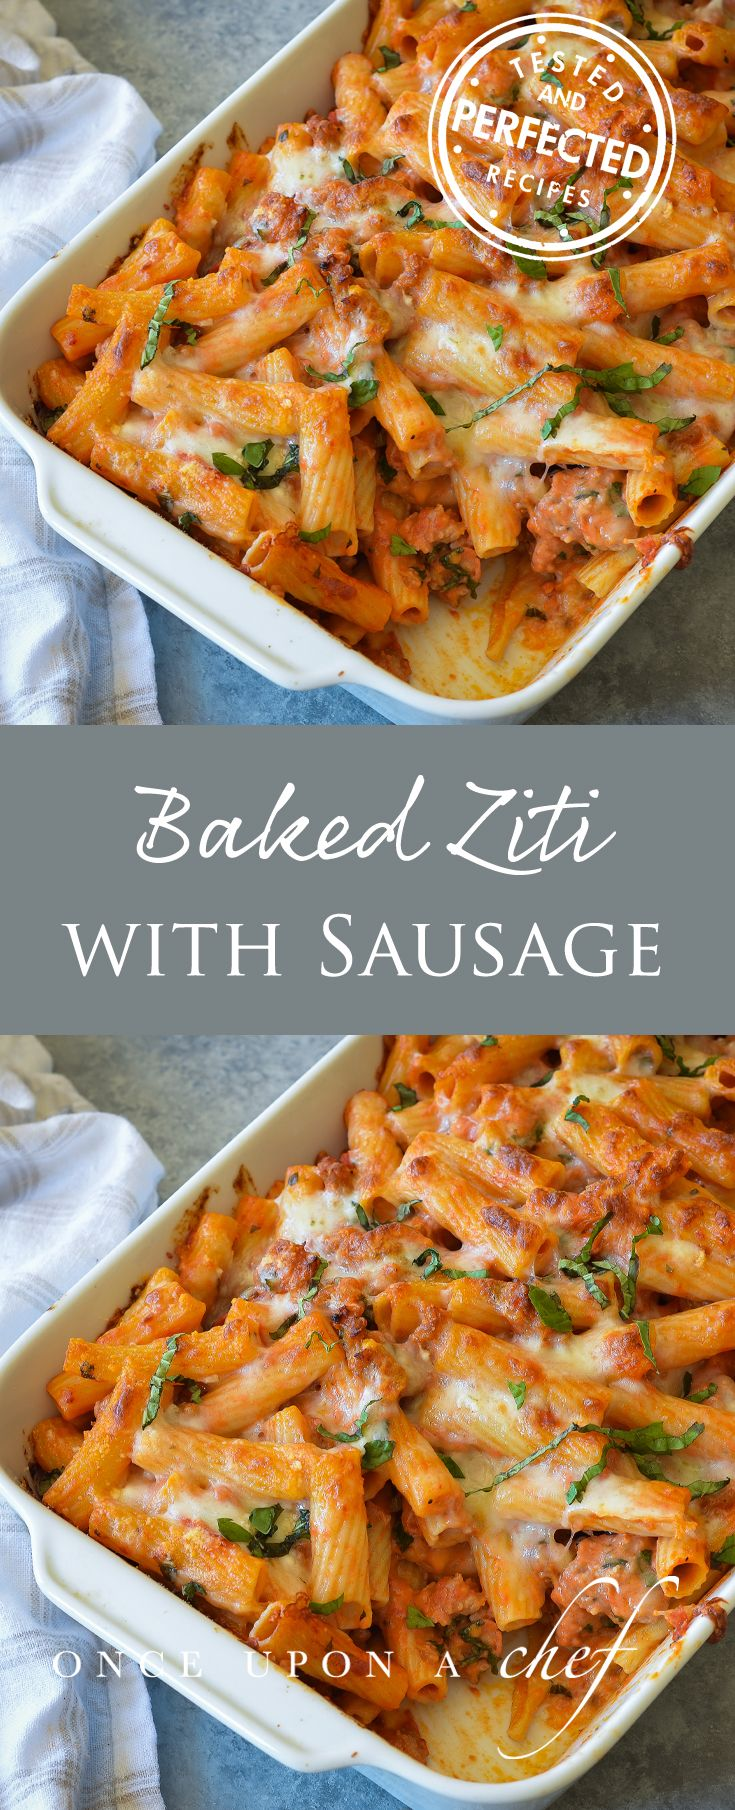 Baked Ziti With Sausage Recipe Baked Ziti With Sausage Italian Sausage Recipes Baked Ziti